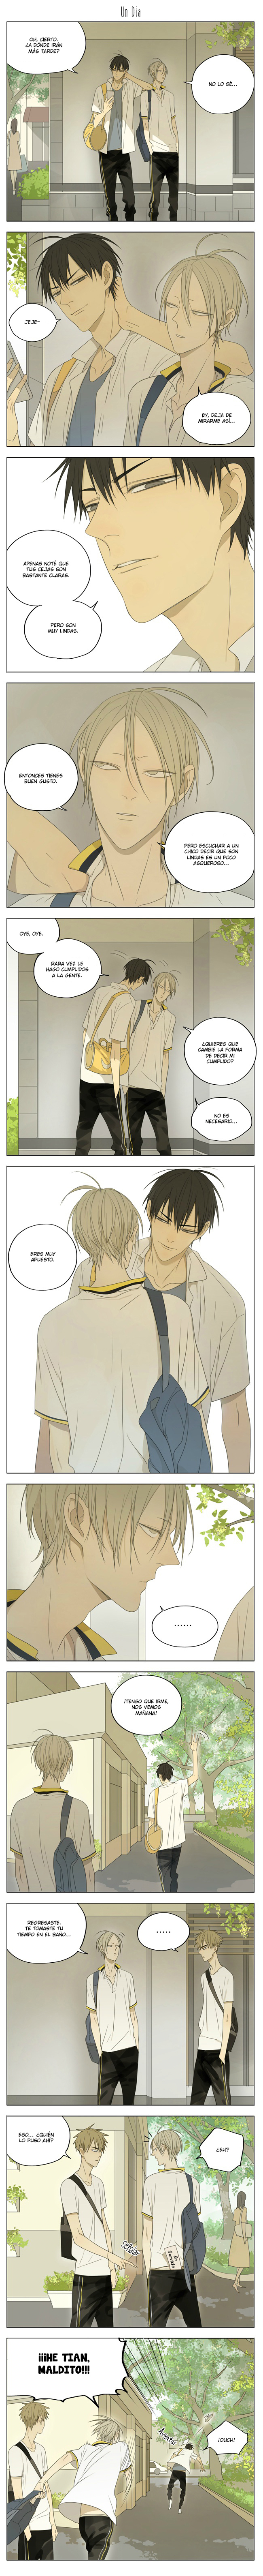 http://c5.ninemanga.com/es_manga/7/15943/392074/0af07e9885819ecb85897611e758433b.jpg Page 8